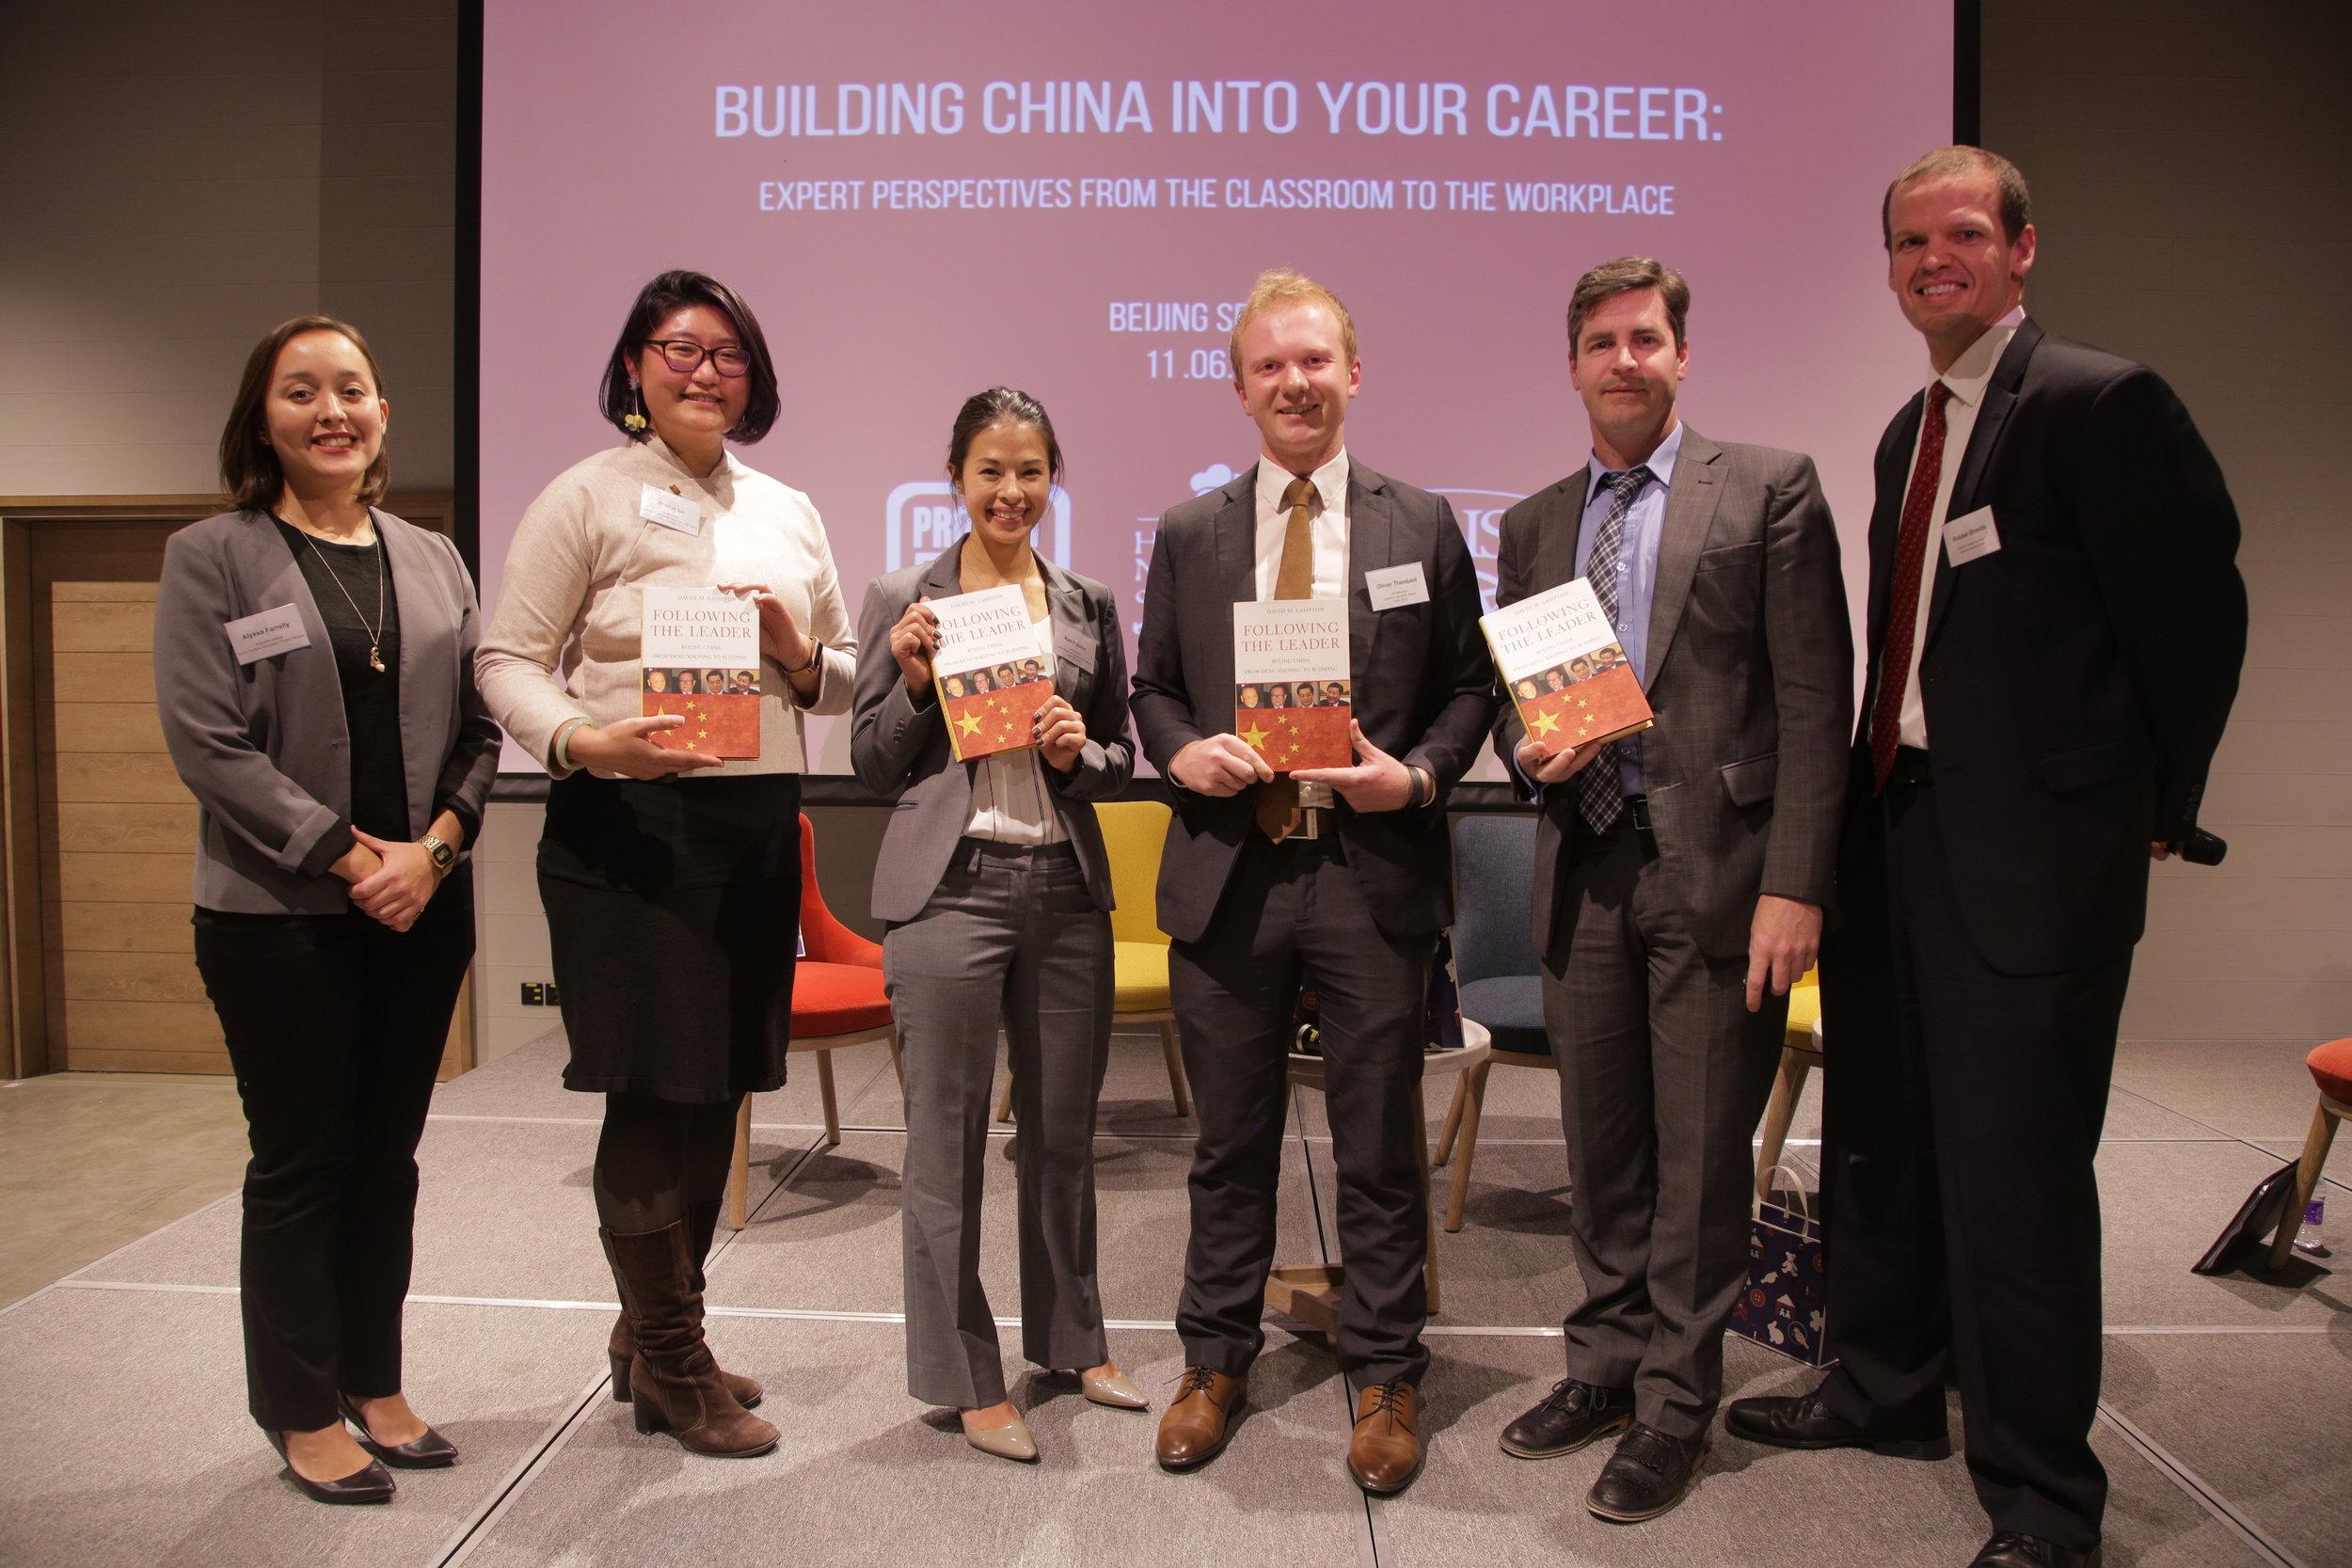 Building_China_Into_Career_11-6-2017.jpg